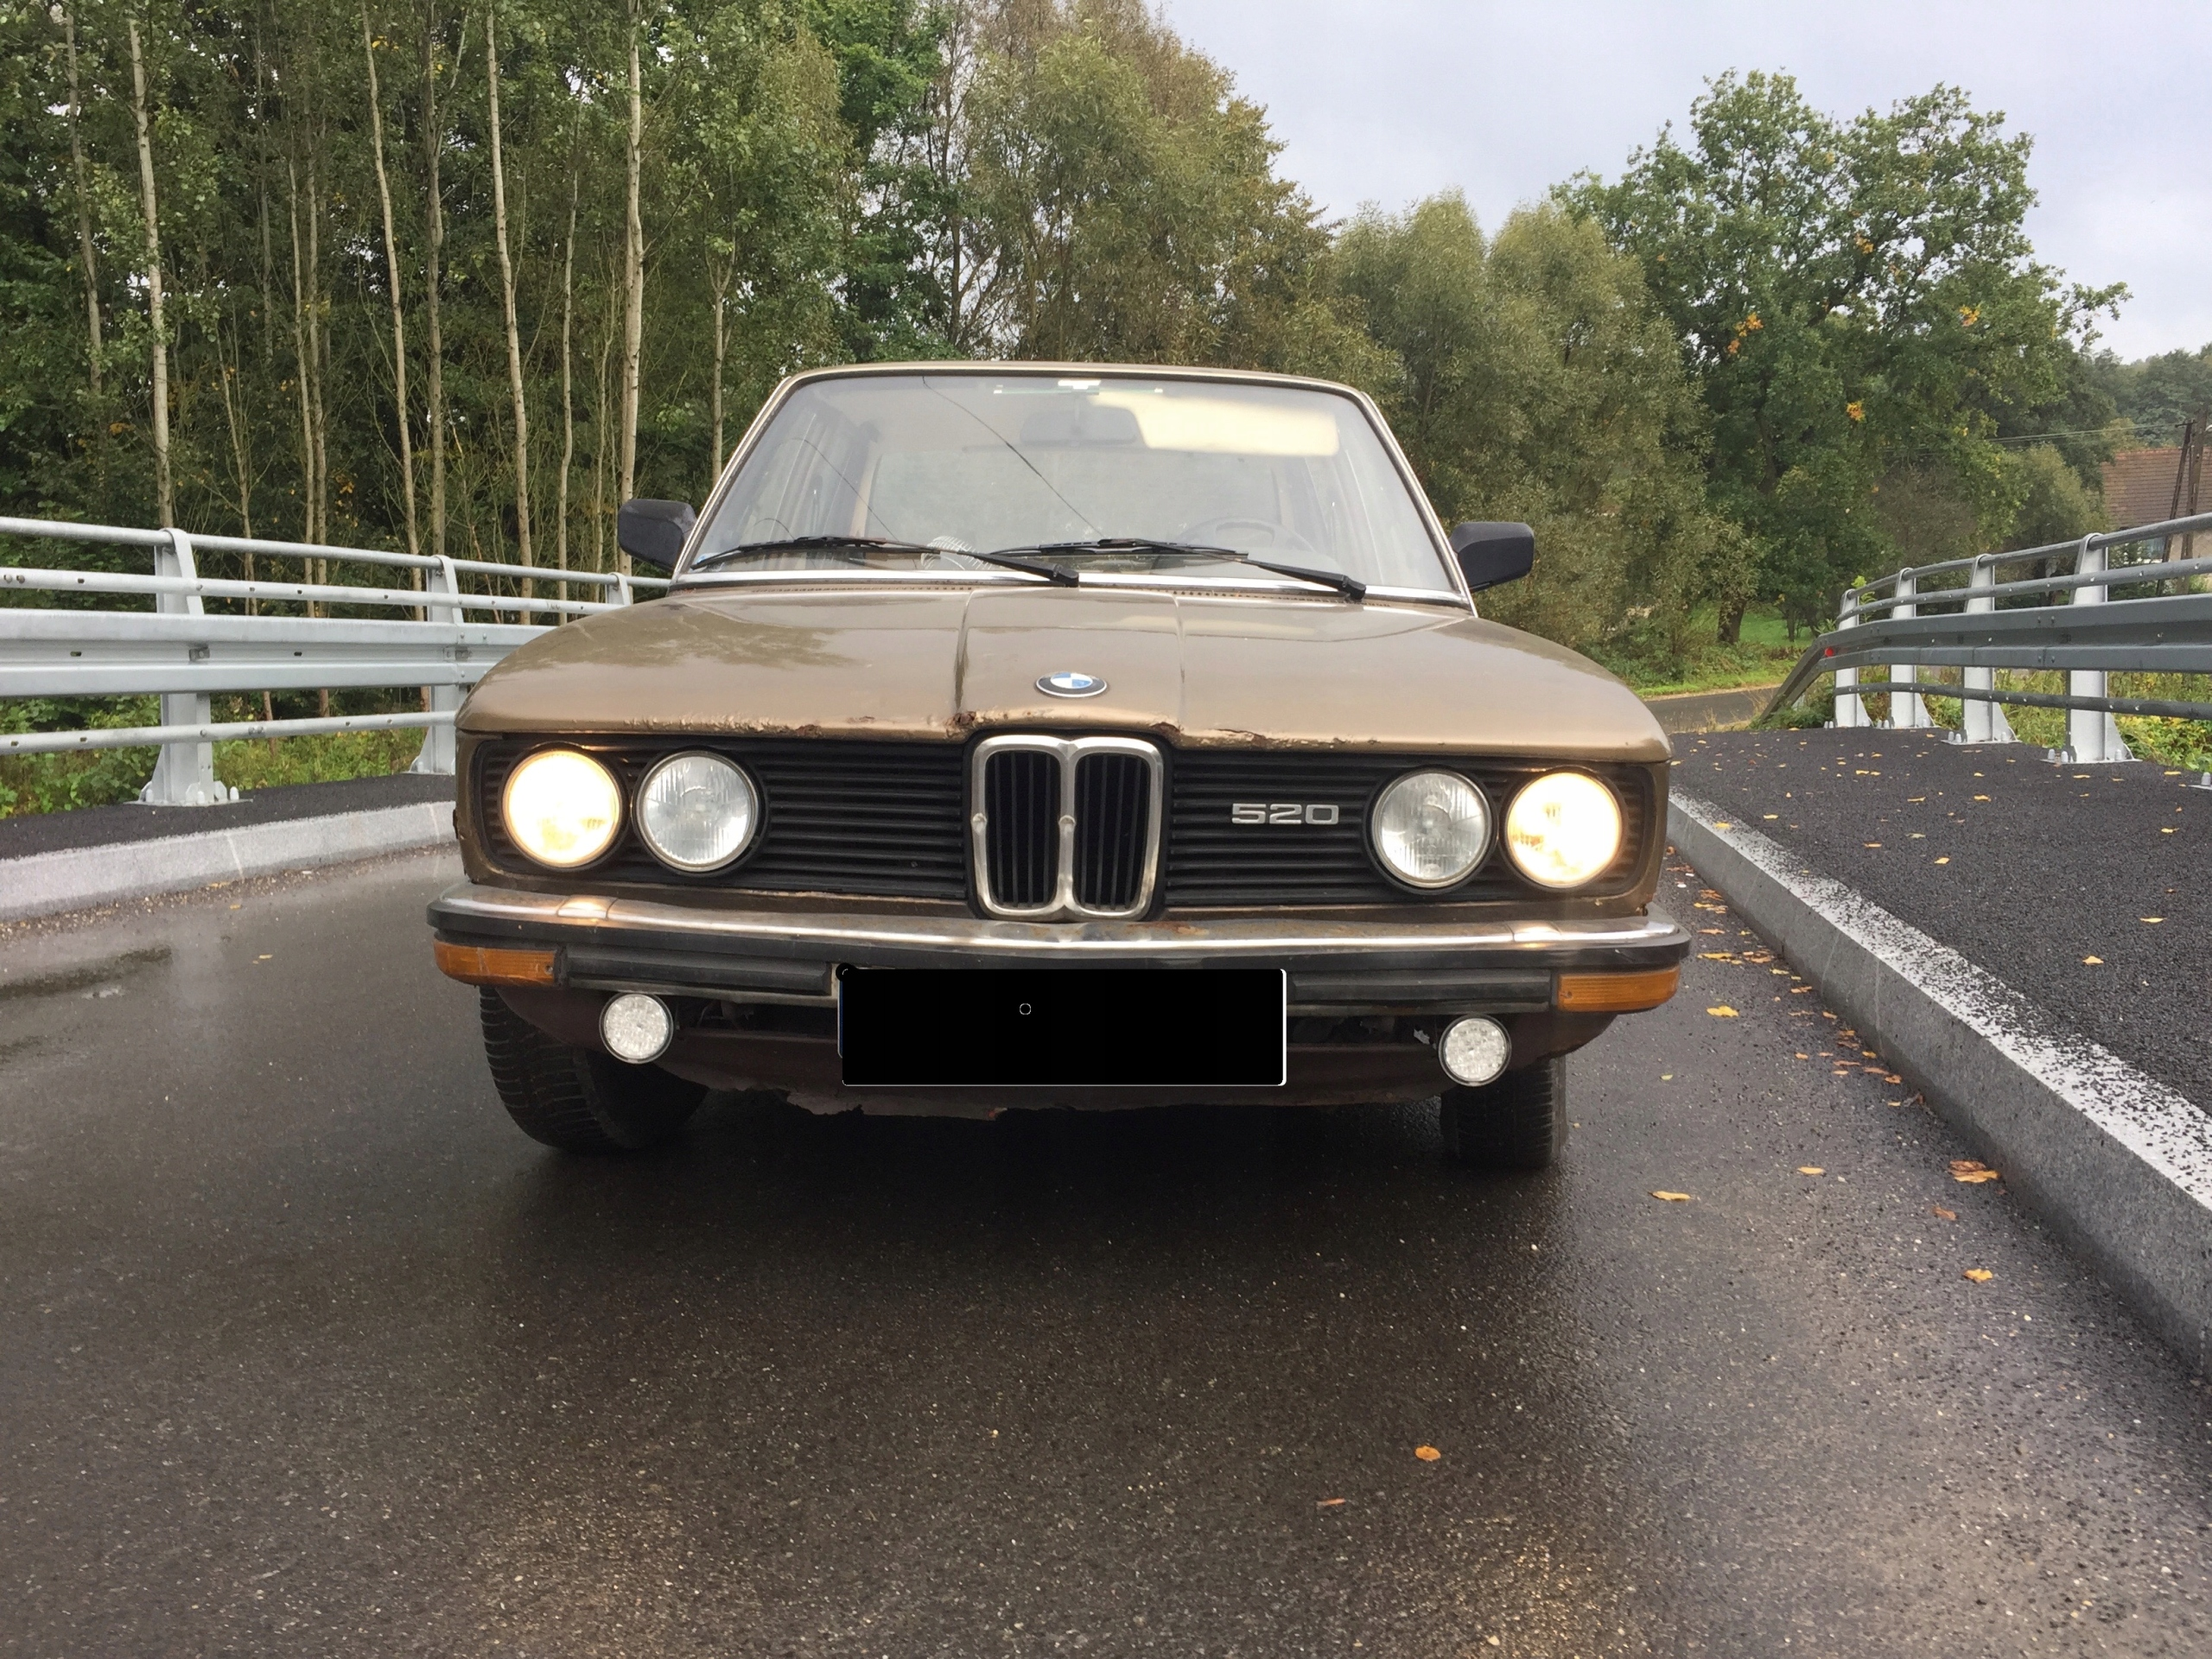 BMW 520 E12 1979r REKIN